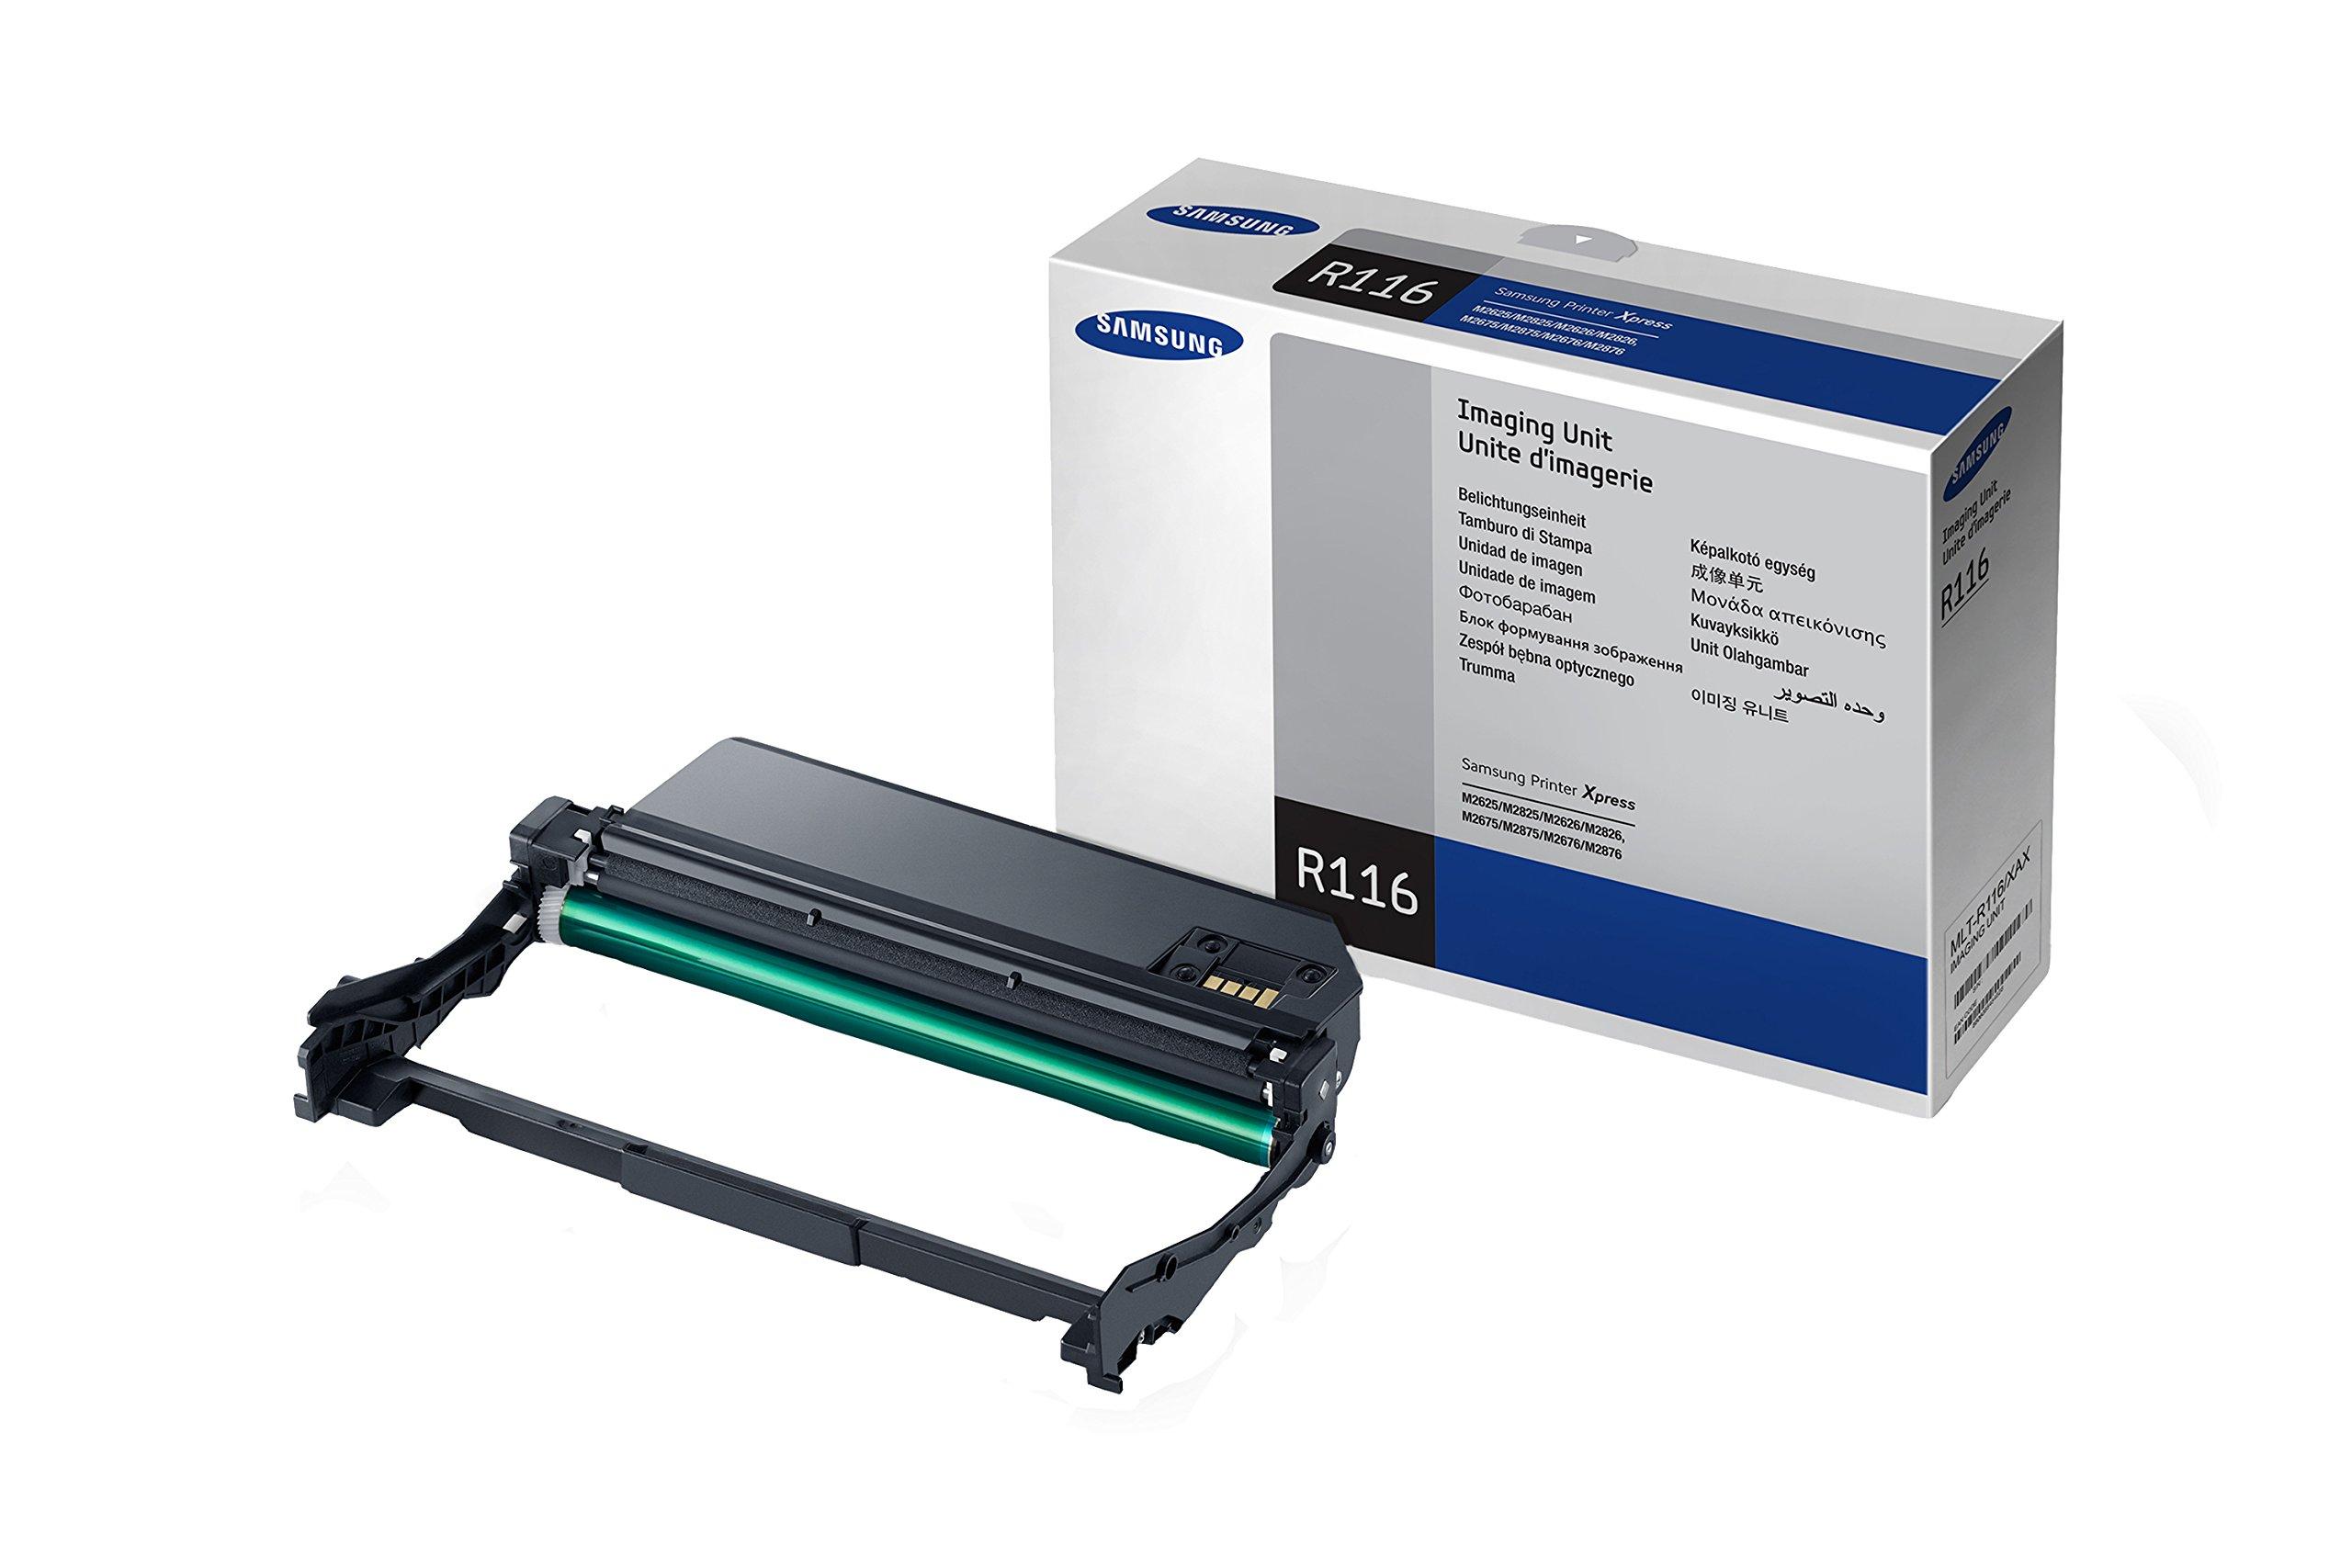 SAMSUNG-MLT-R116SEE-Bildtrommel-PCU-fr-Samsung-Xpress-SL-M26252825-M26752875-Schwarz